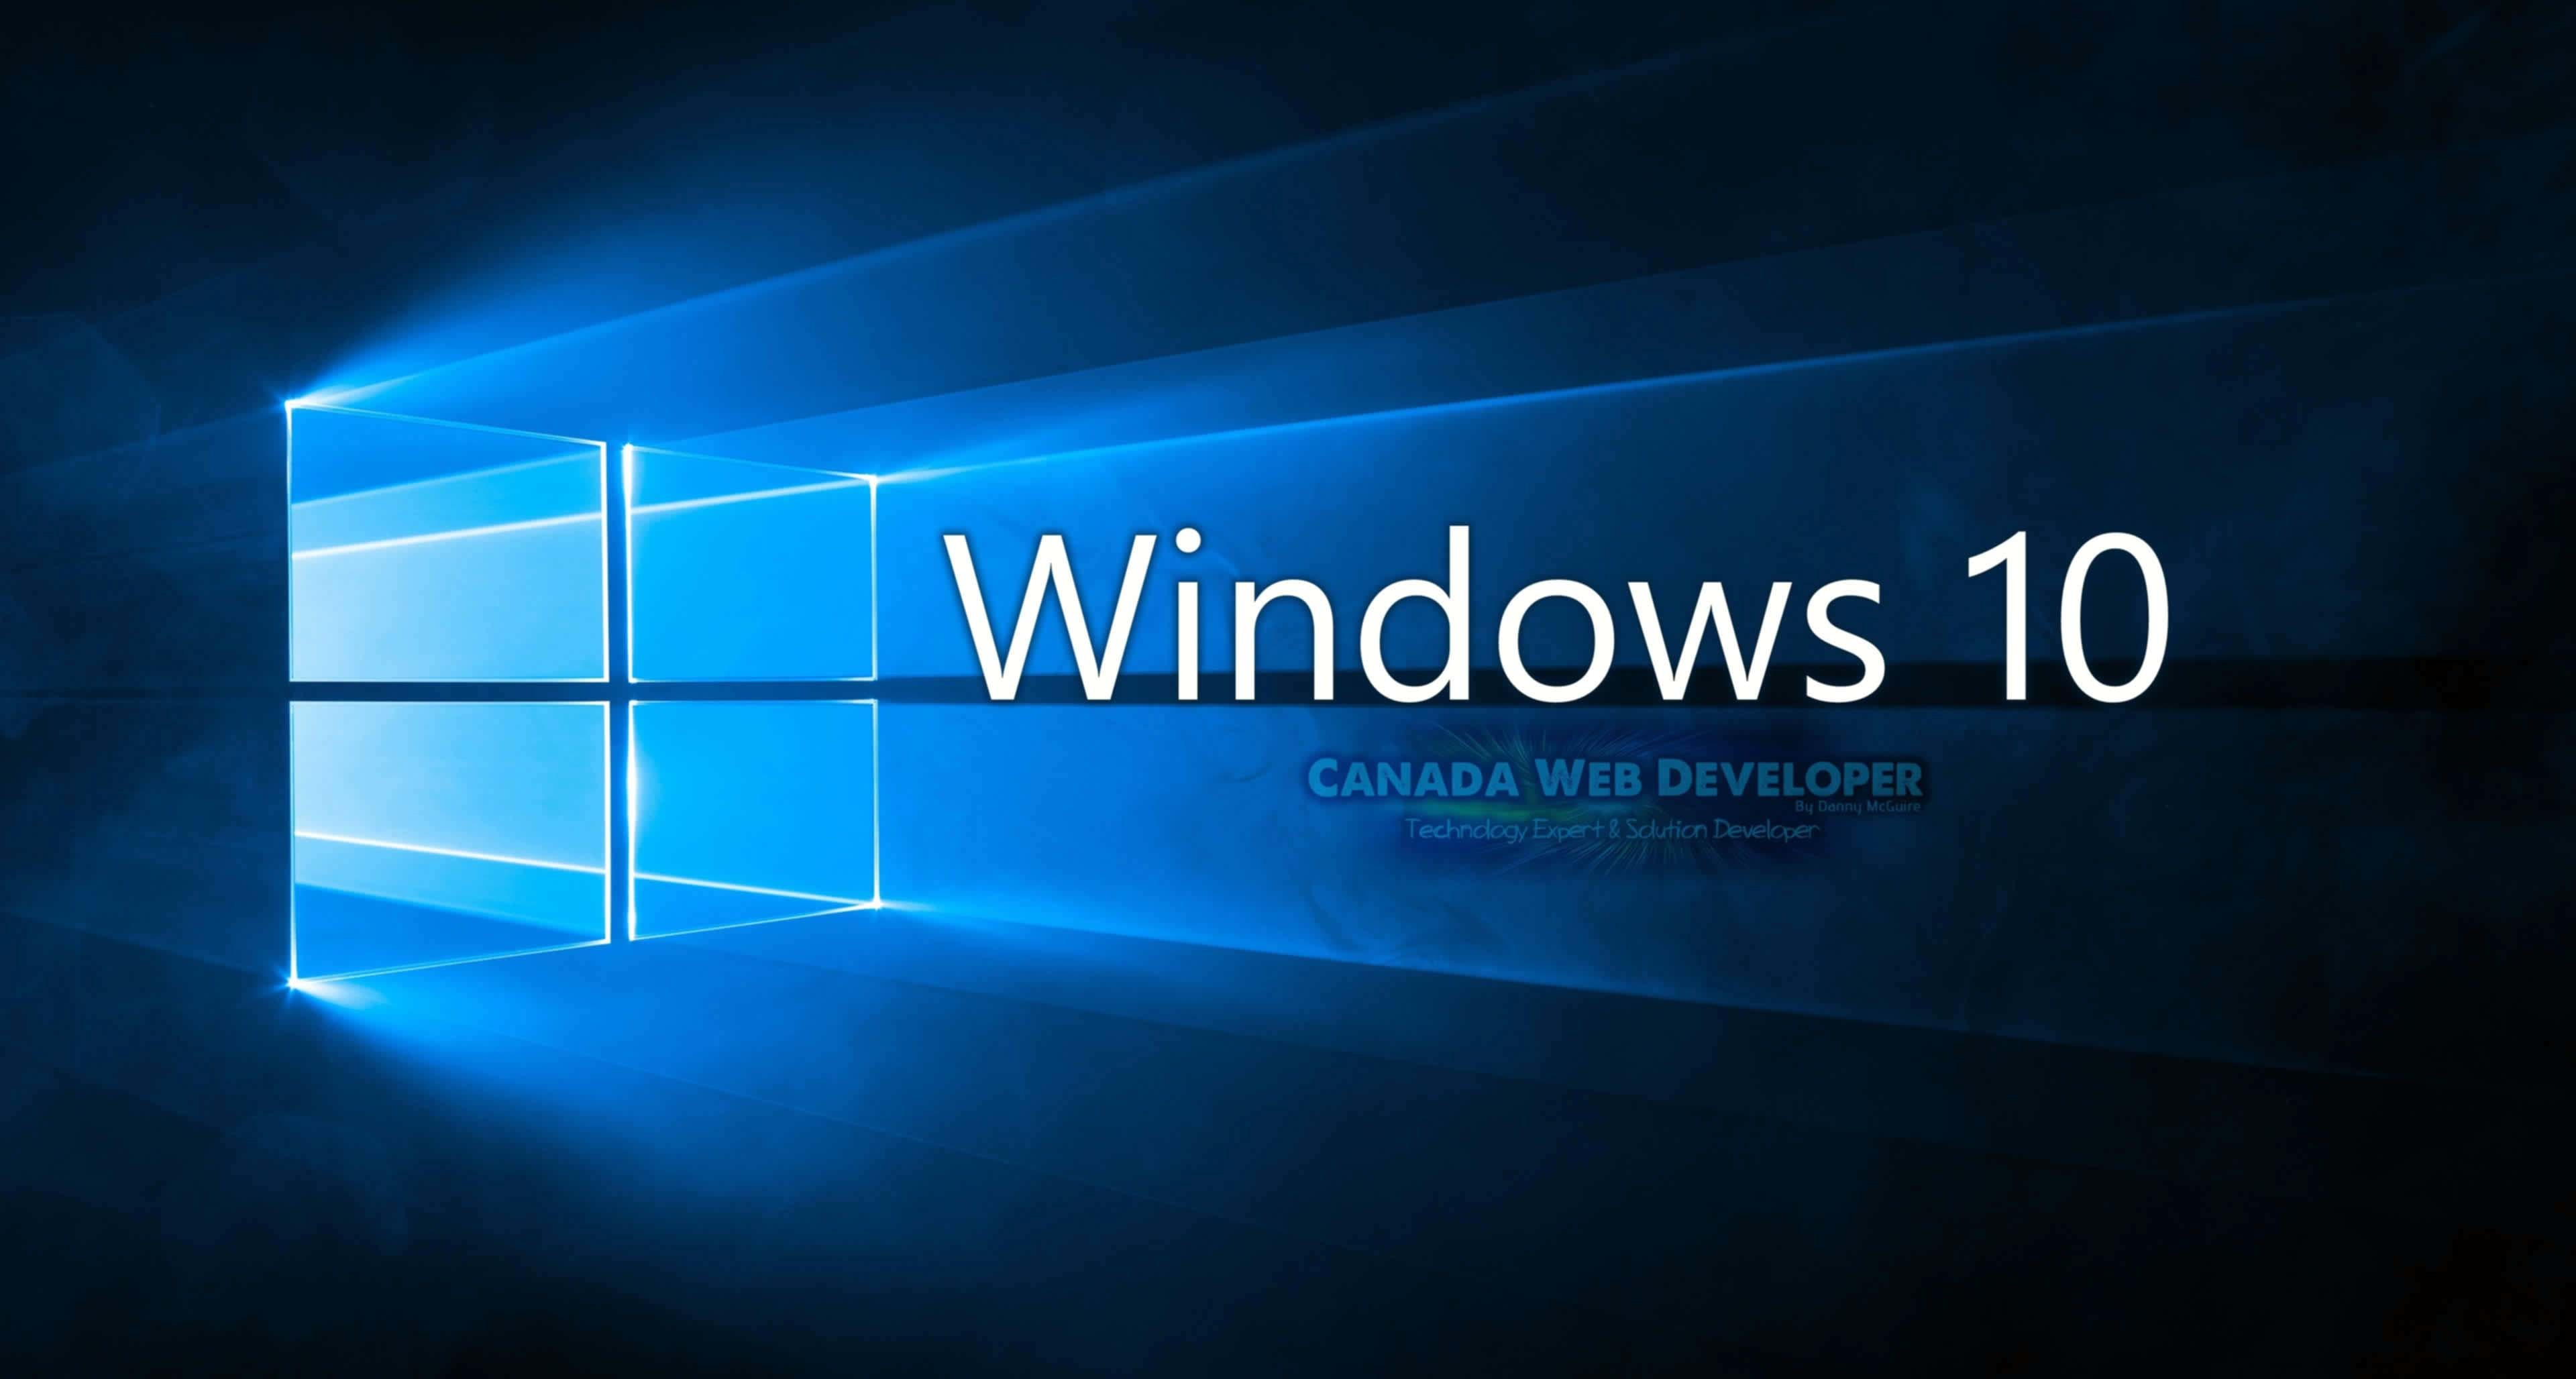 Windows 10 Logo Hd Wallpaper 74 Images